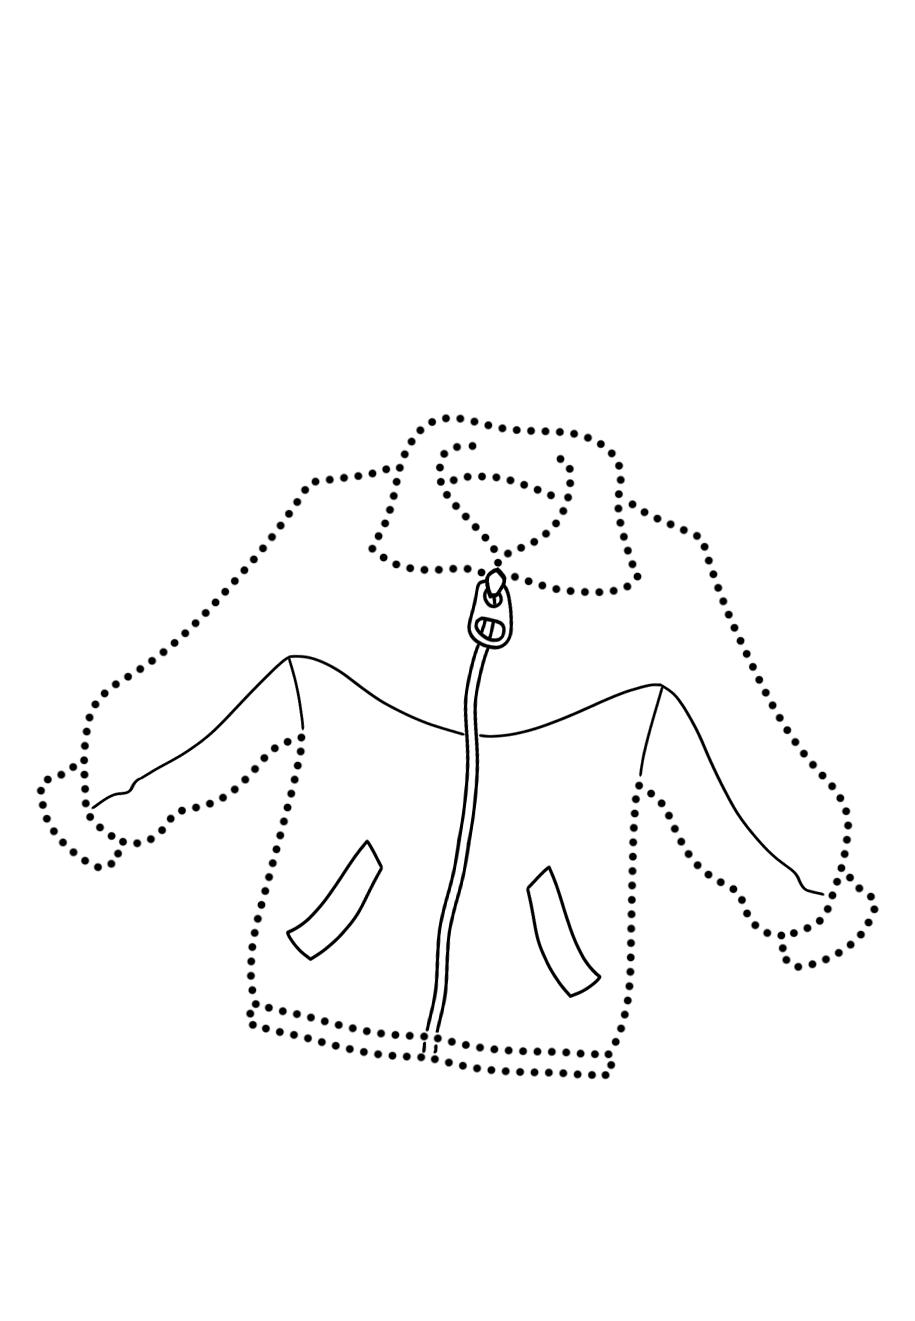 Одежда по точкам - Рисуем по точкам - Раскраски антистресс